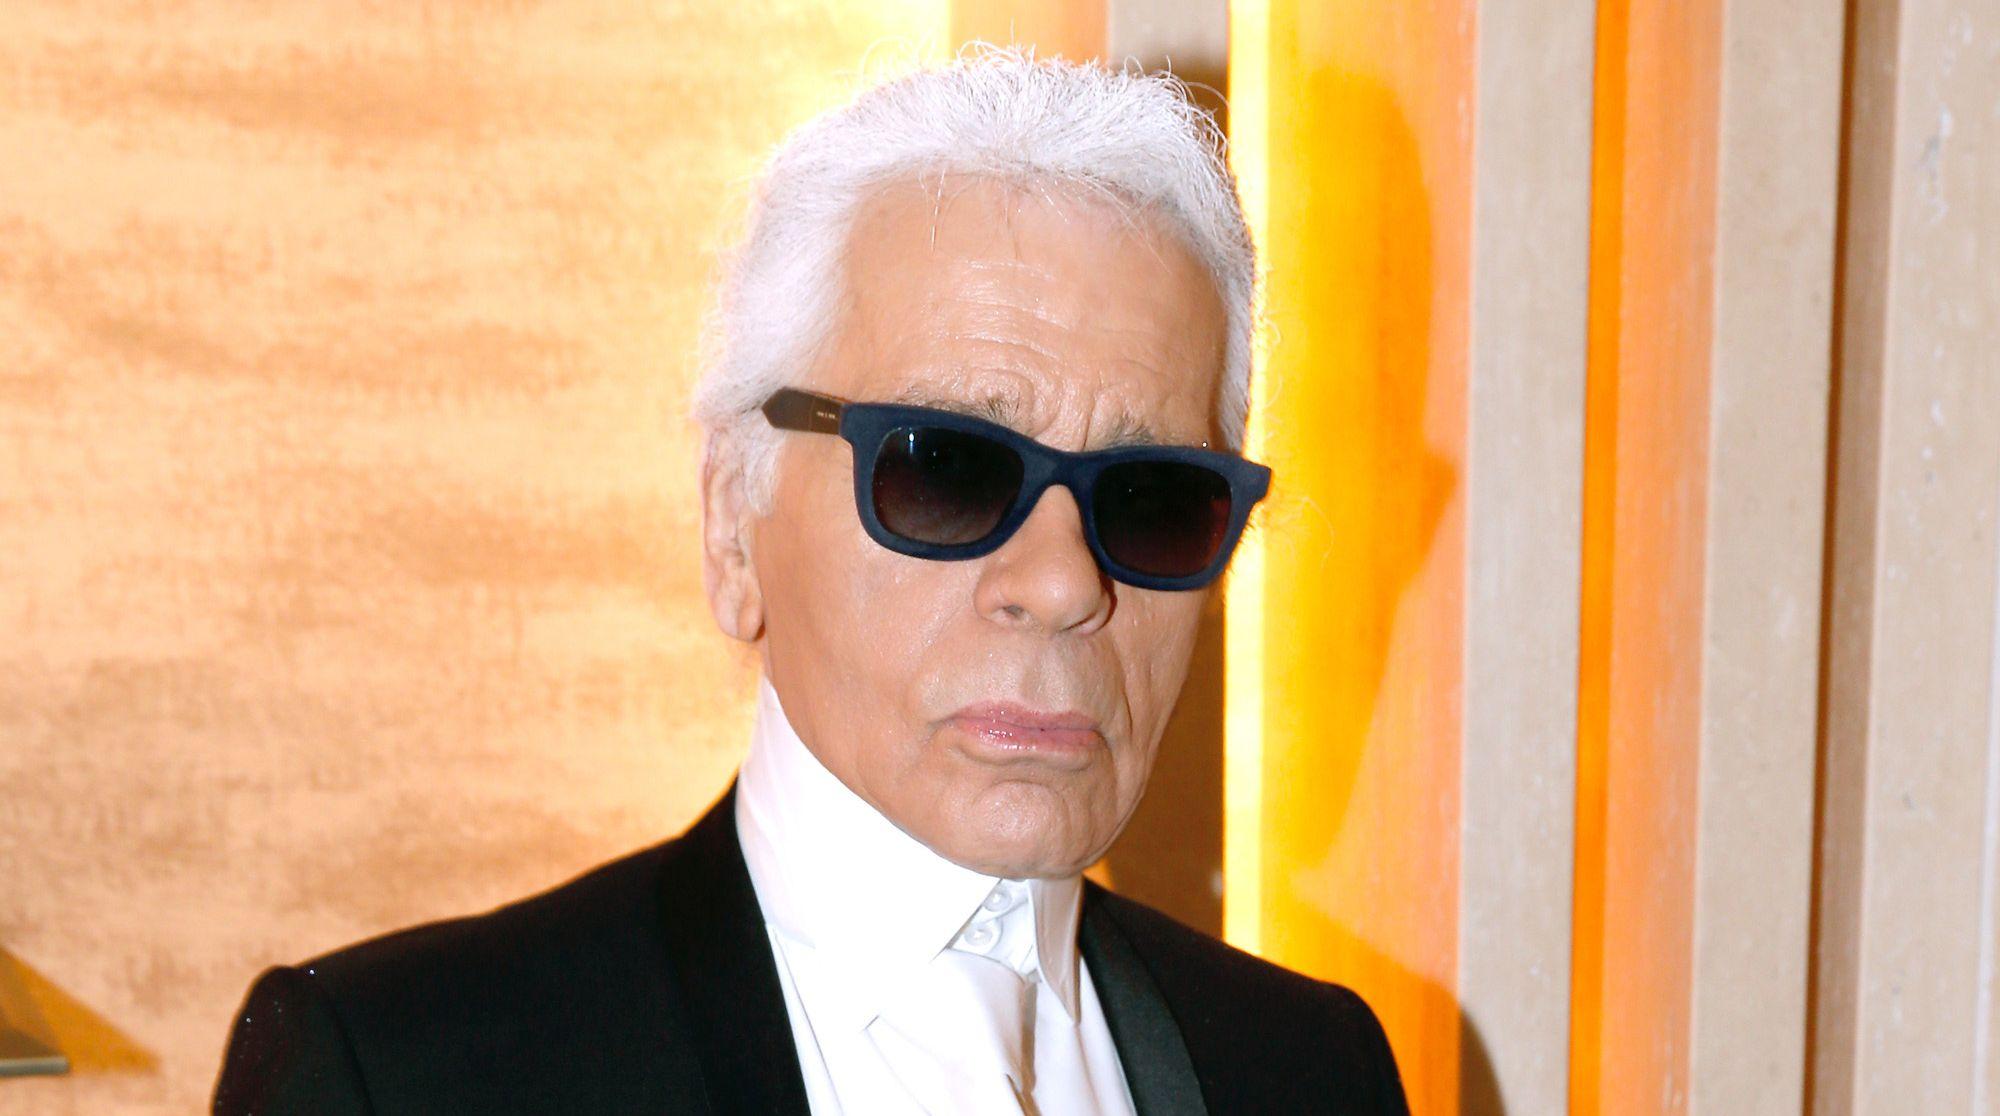 Karl Lagerfeld Has Died Aged 85